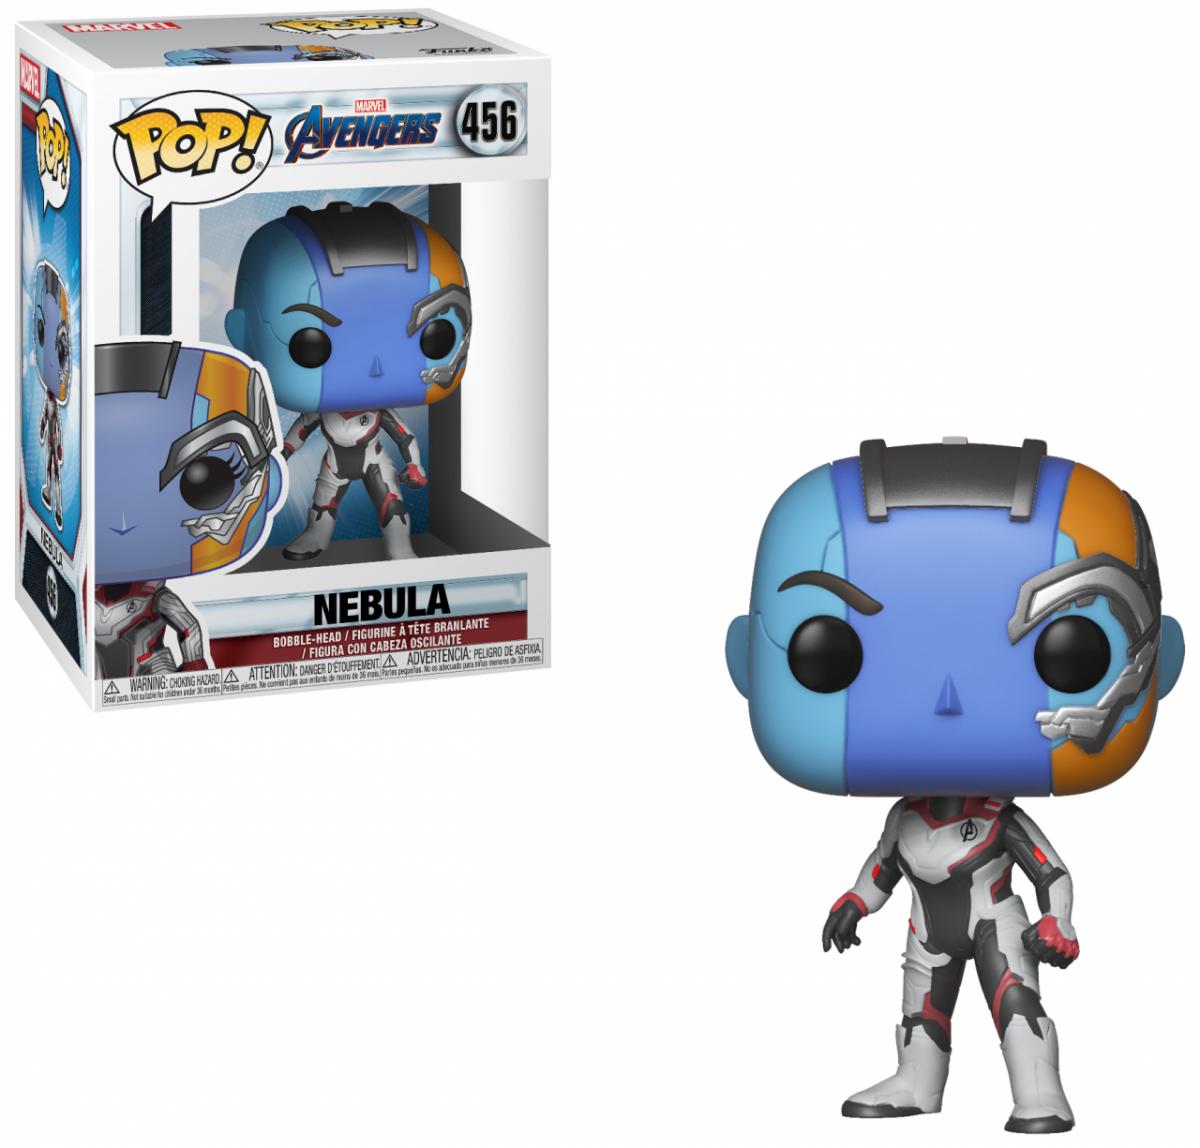 Фигурка Funko POP! Bobble: Небула (Nebula) Мстители: Финал (Avengers Endgame) (36667) 9,5 см